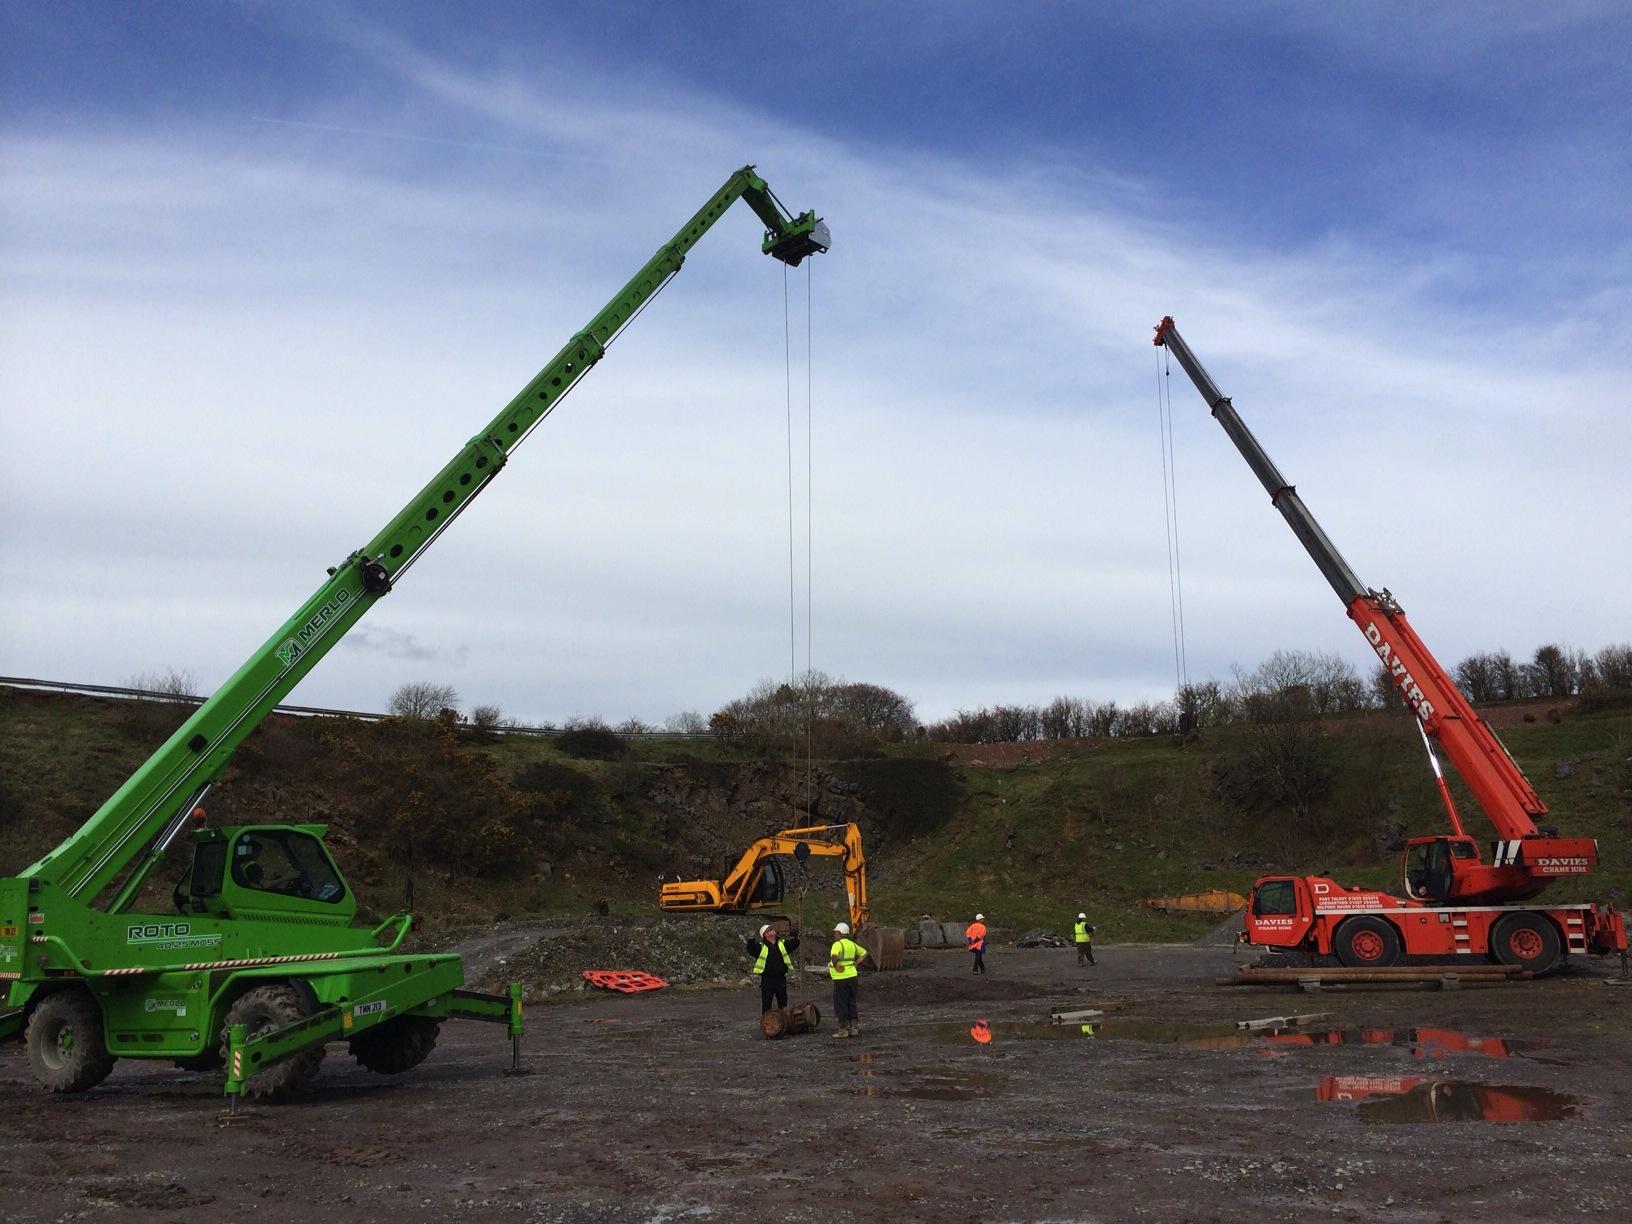 Lifting supervisor training course